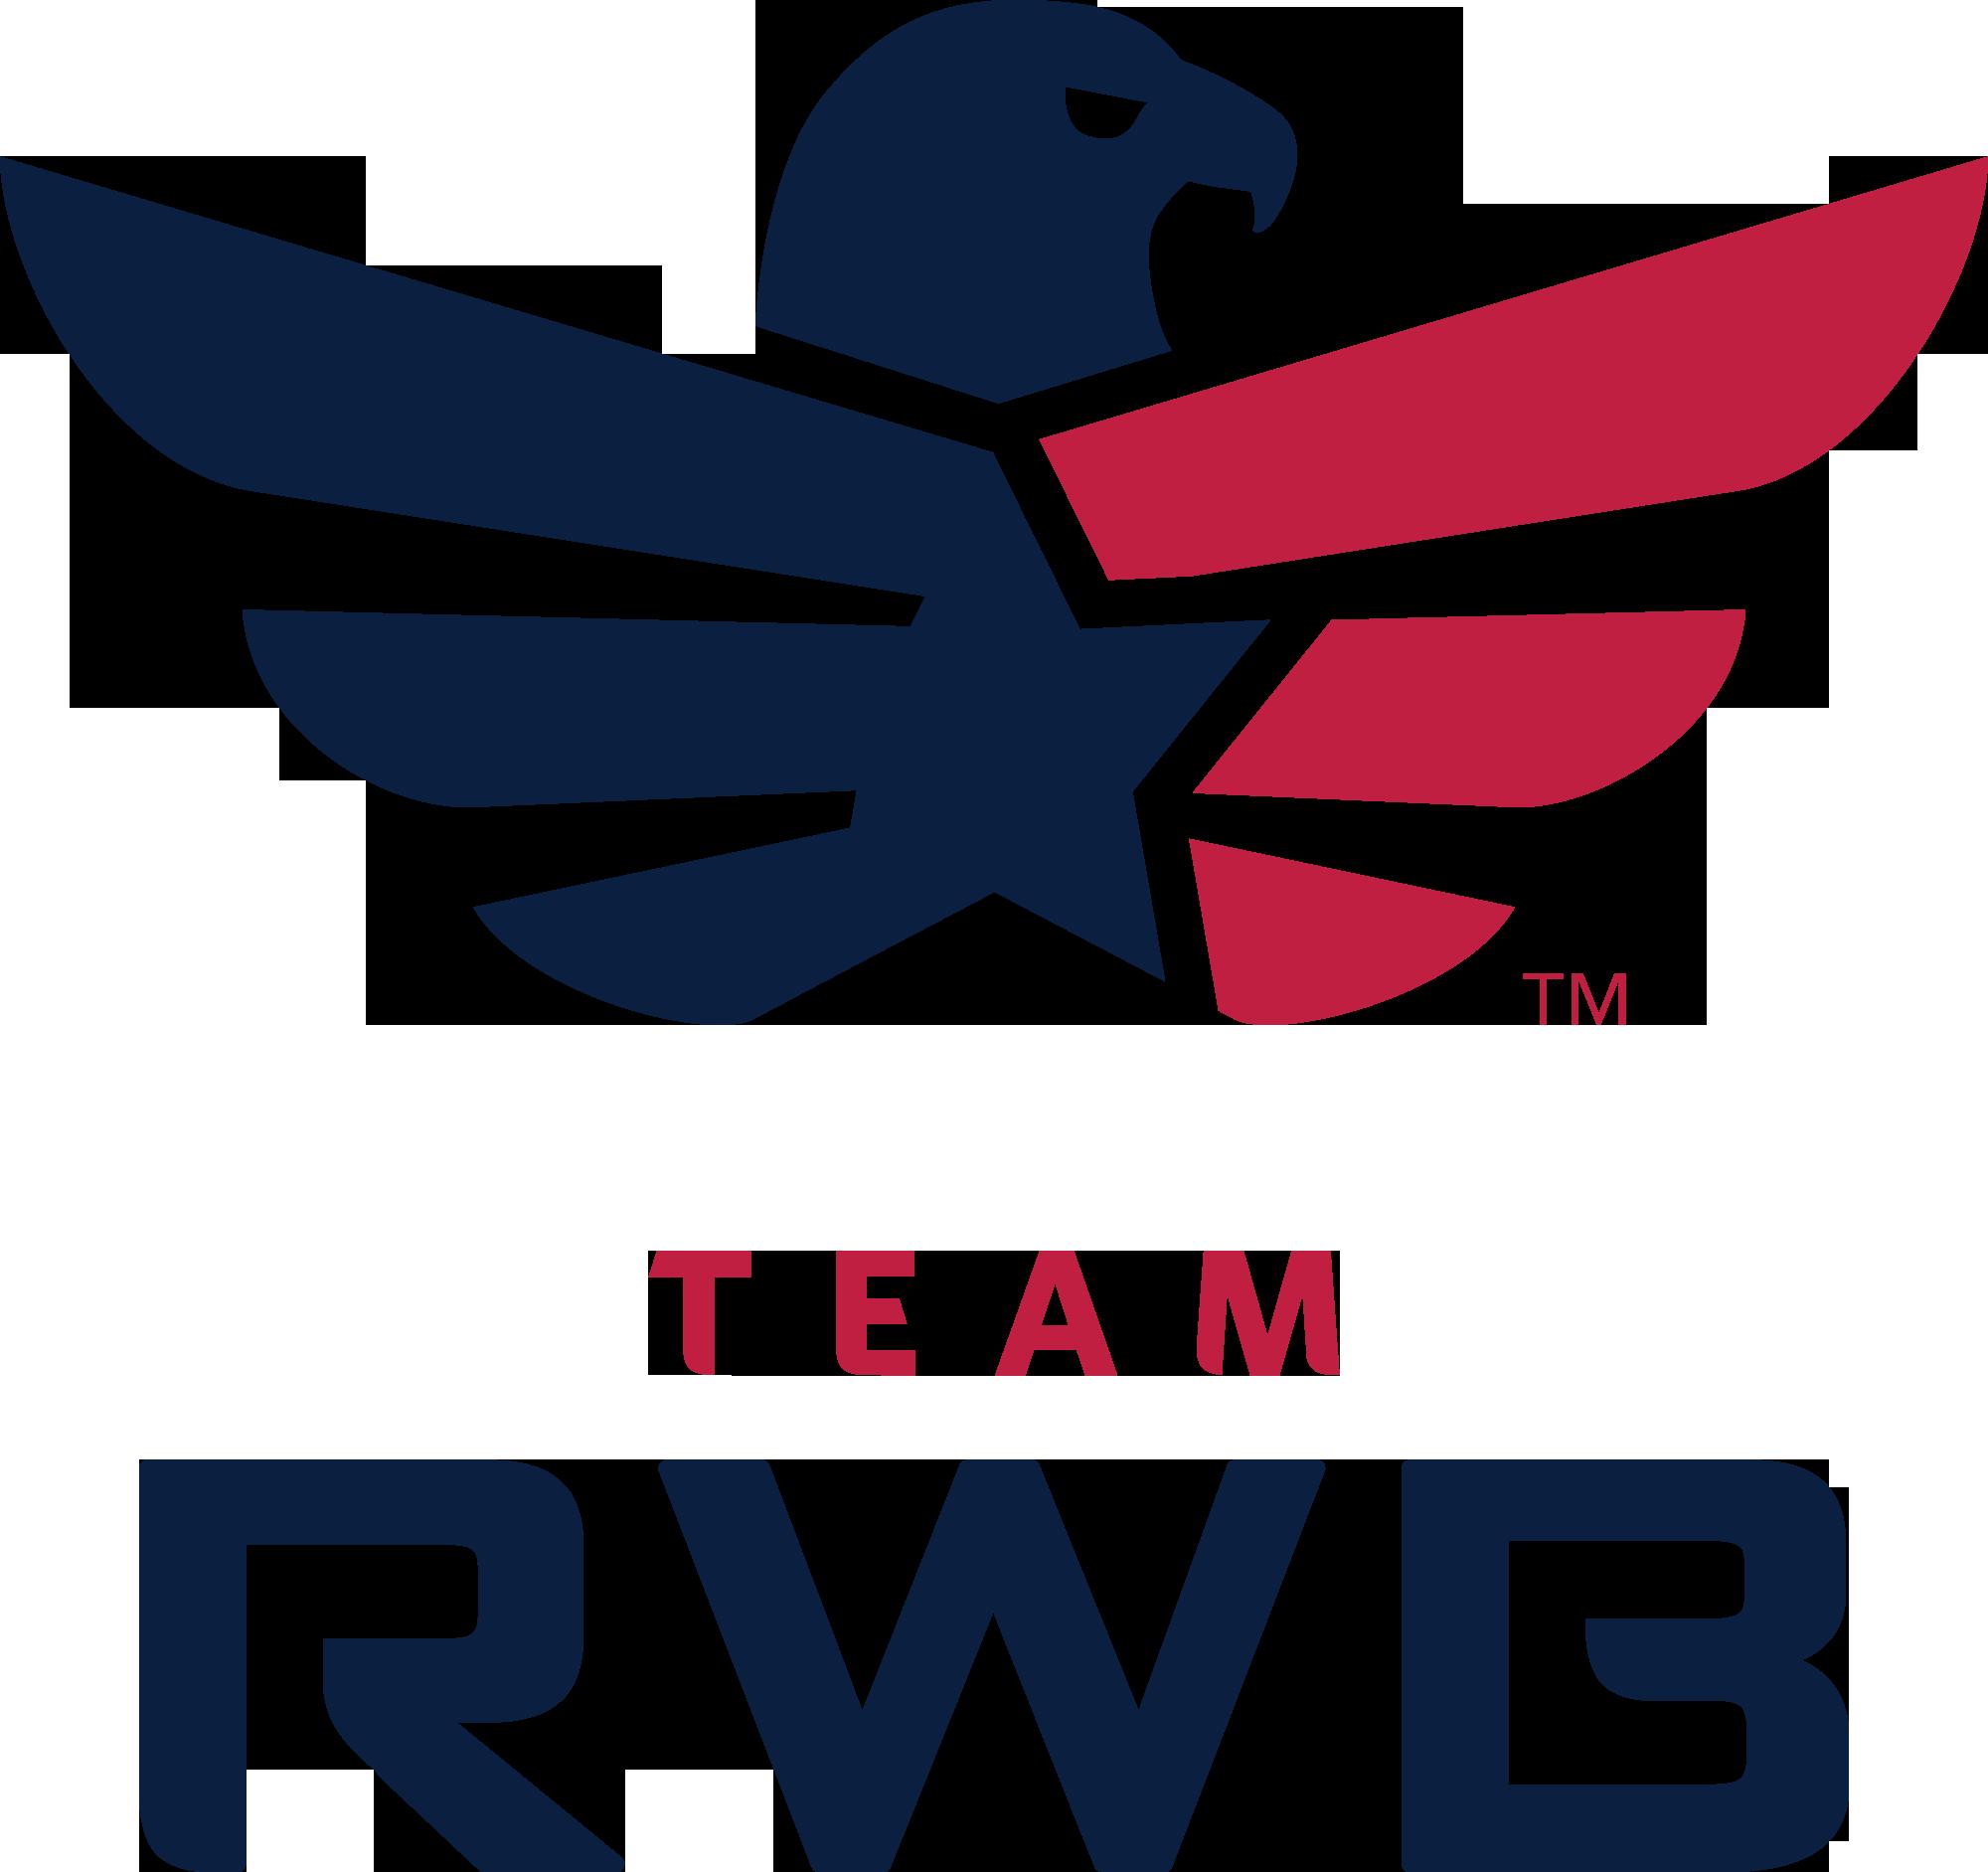 teamrwb-logo-rgb.png